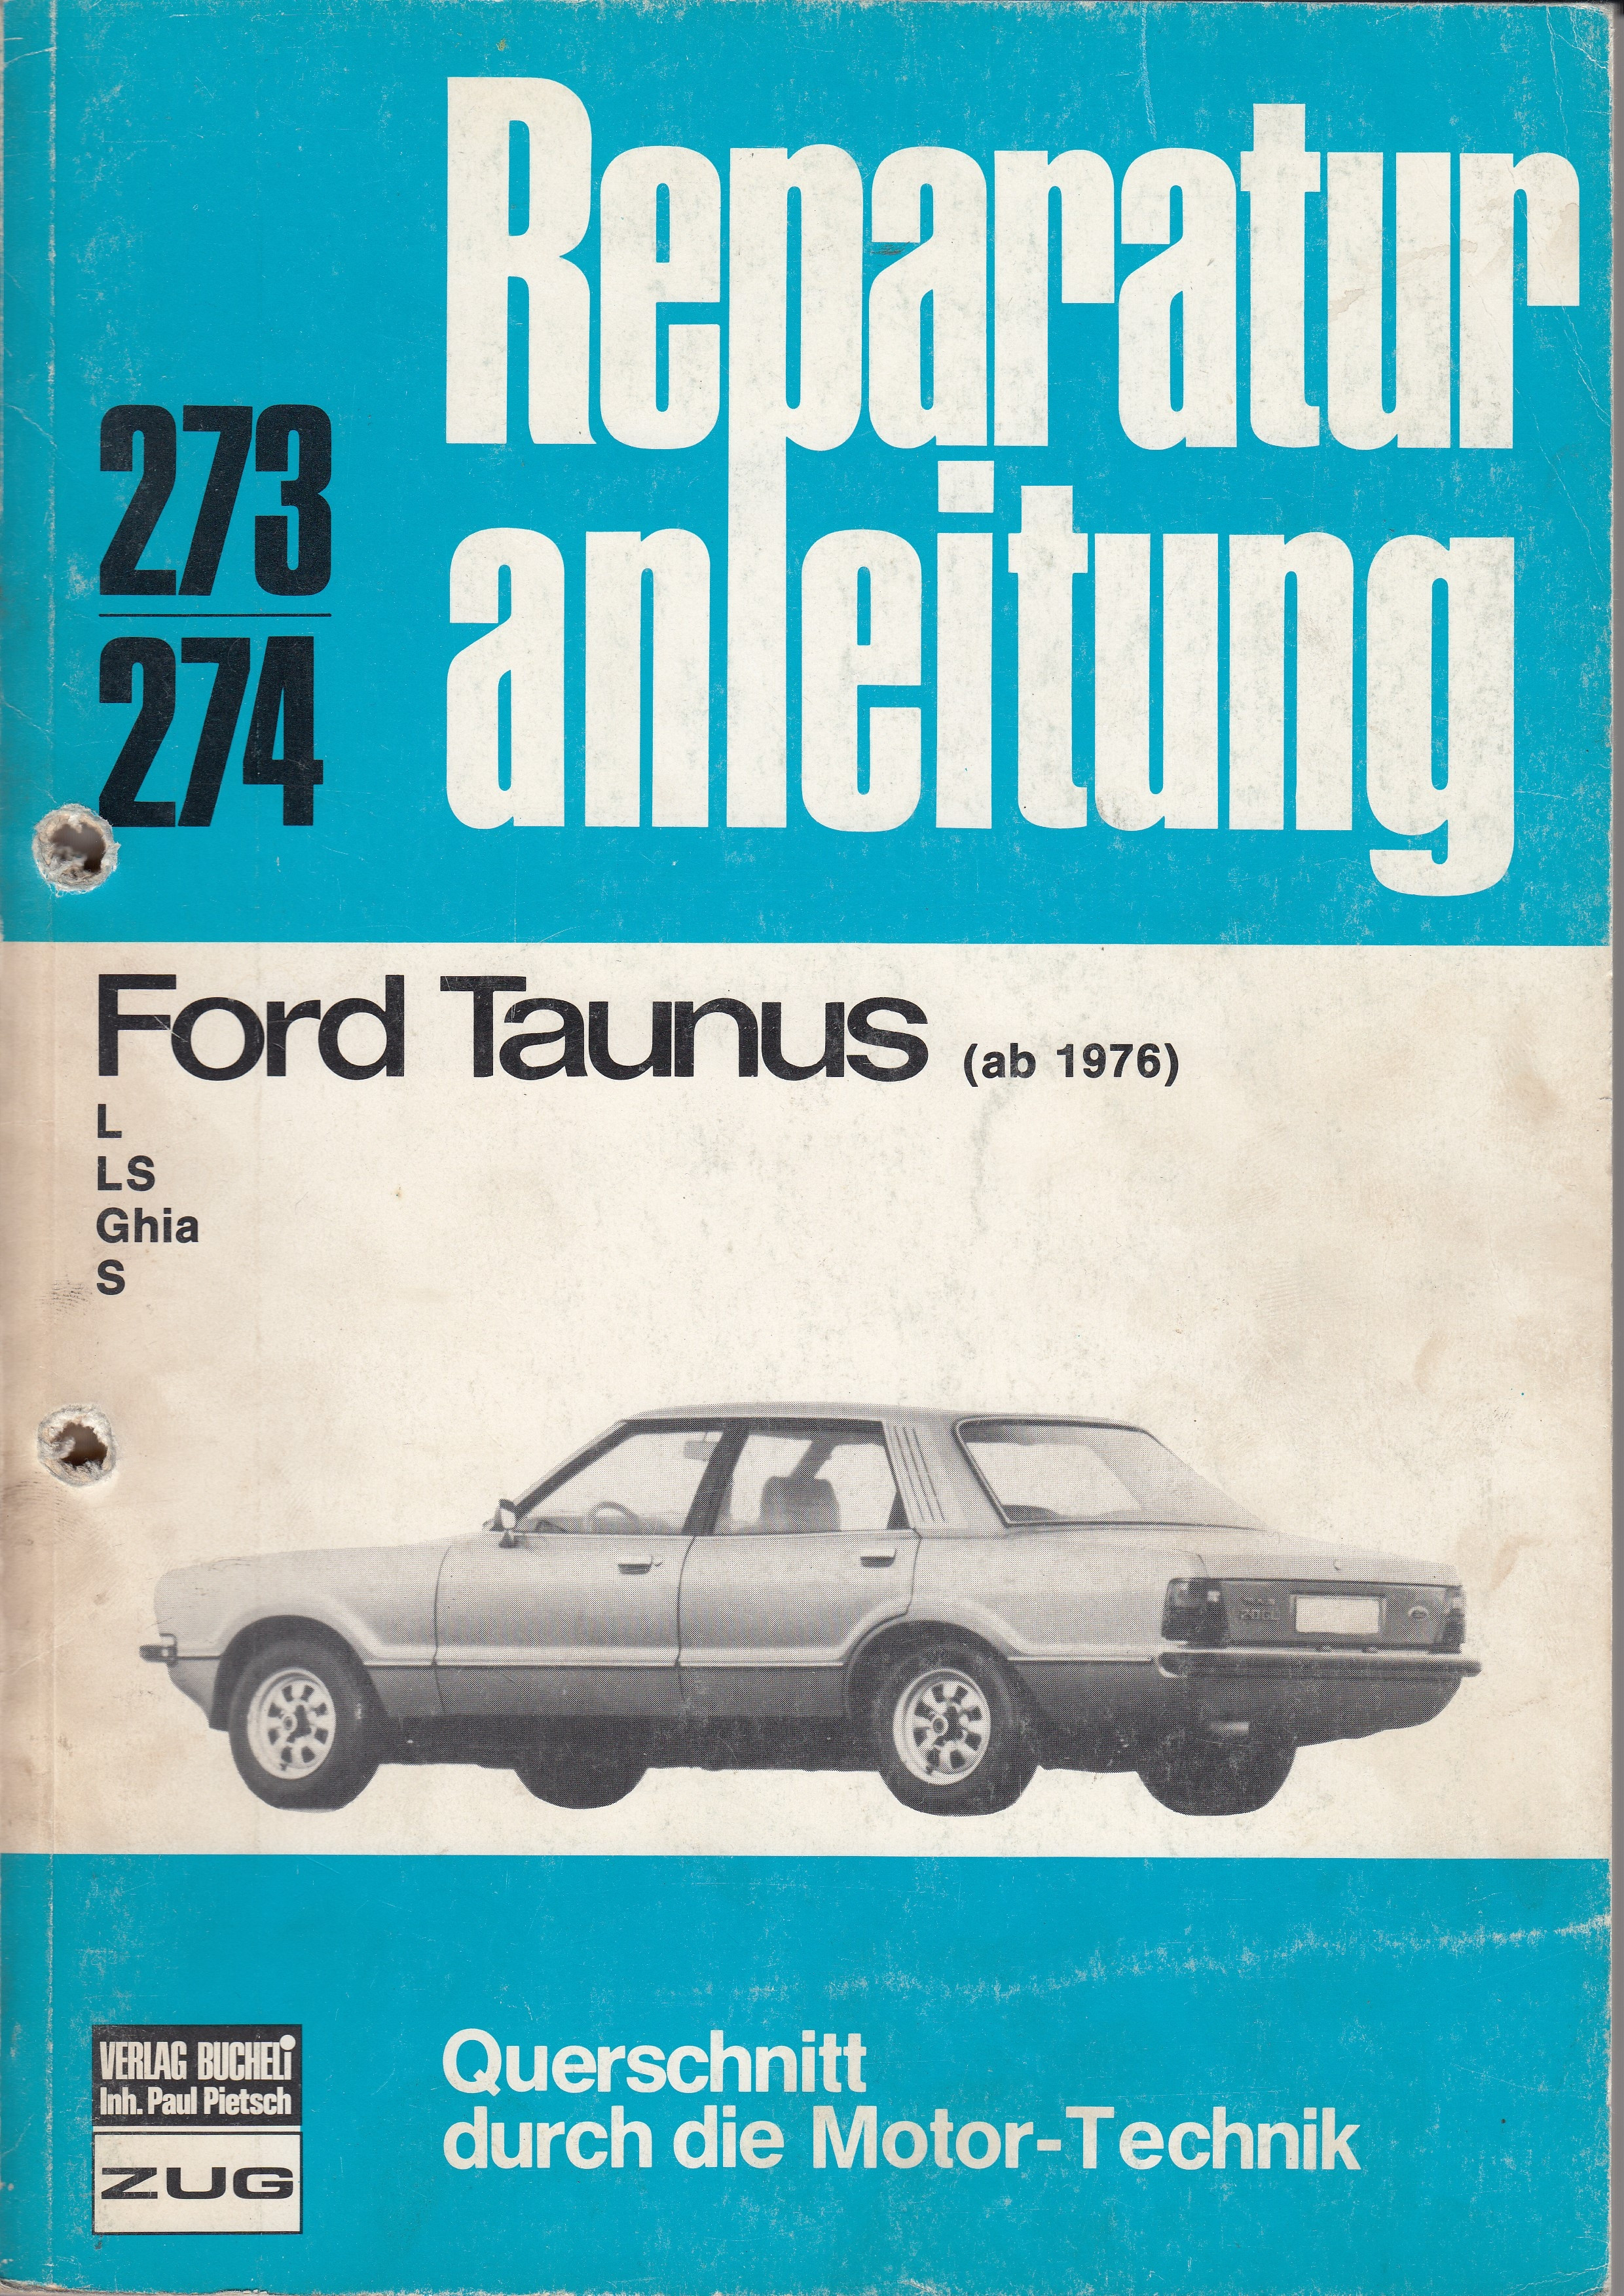 Ford Taunus L / LS / Ghia / S (76-79) - Reparaturanleitung